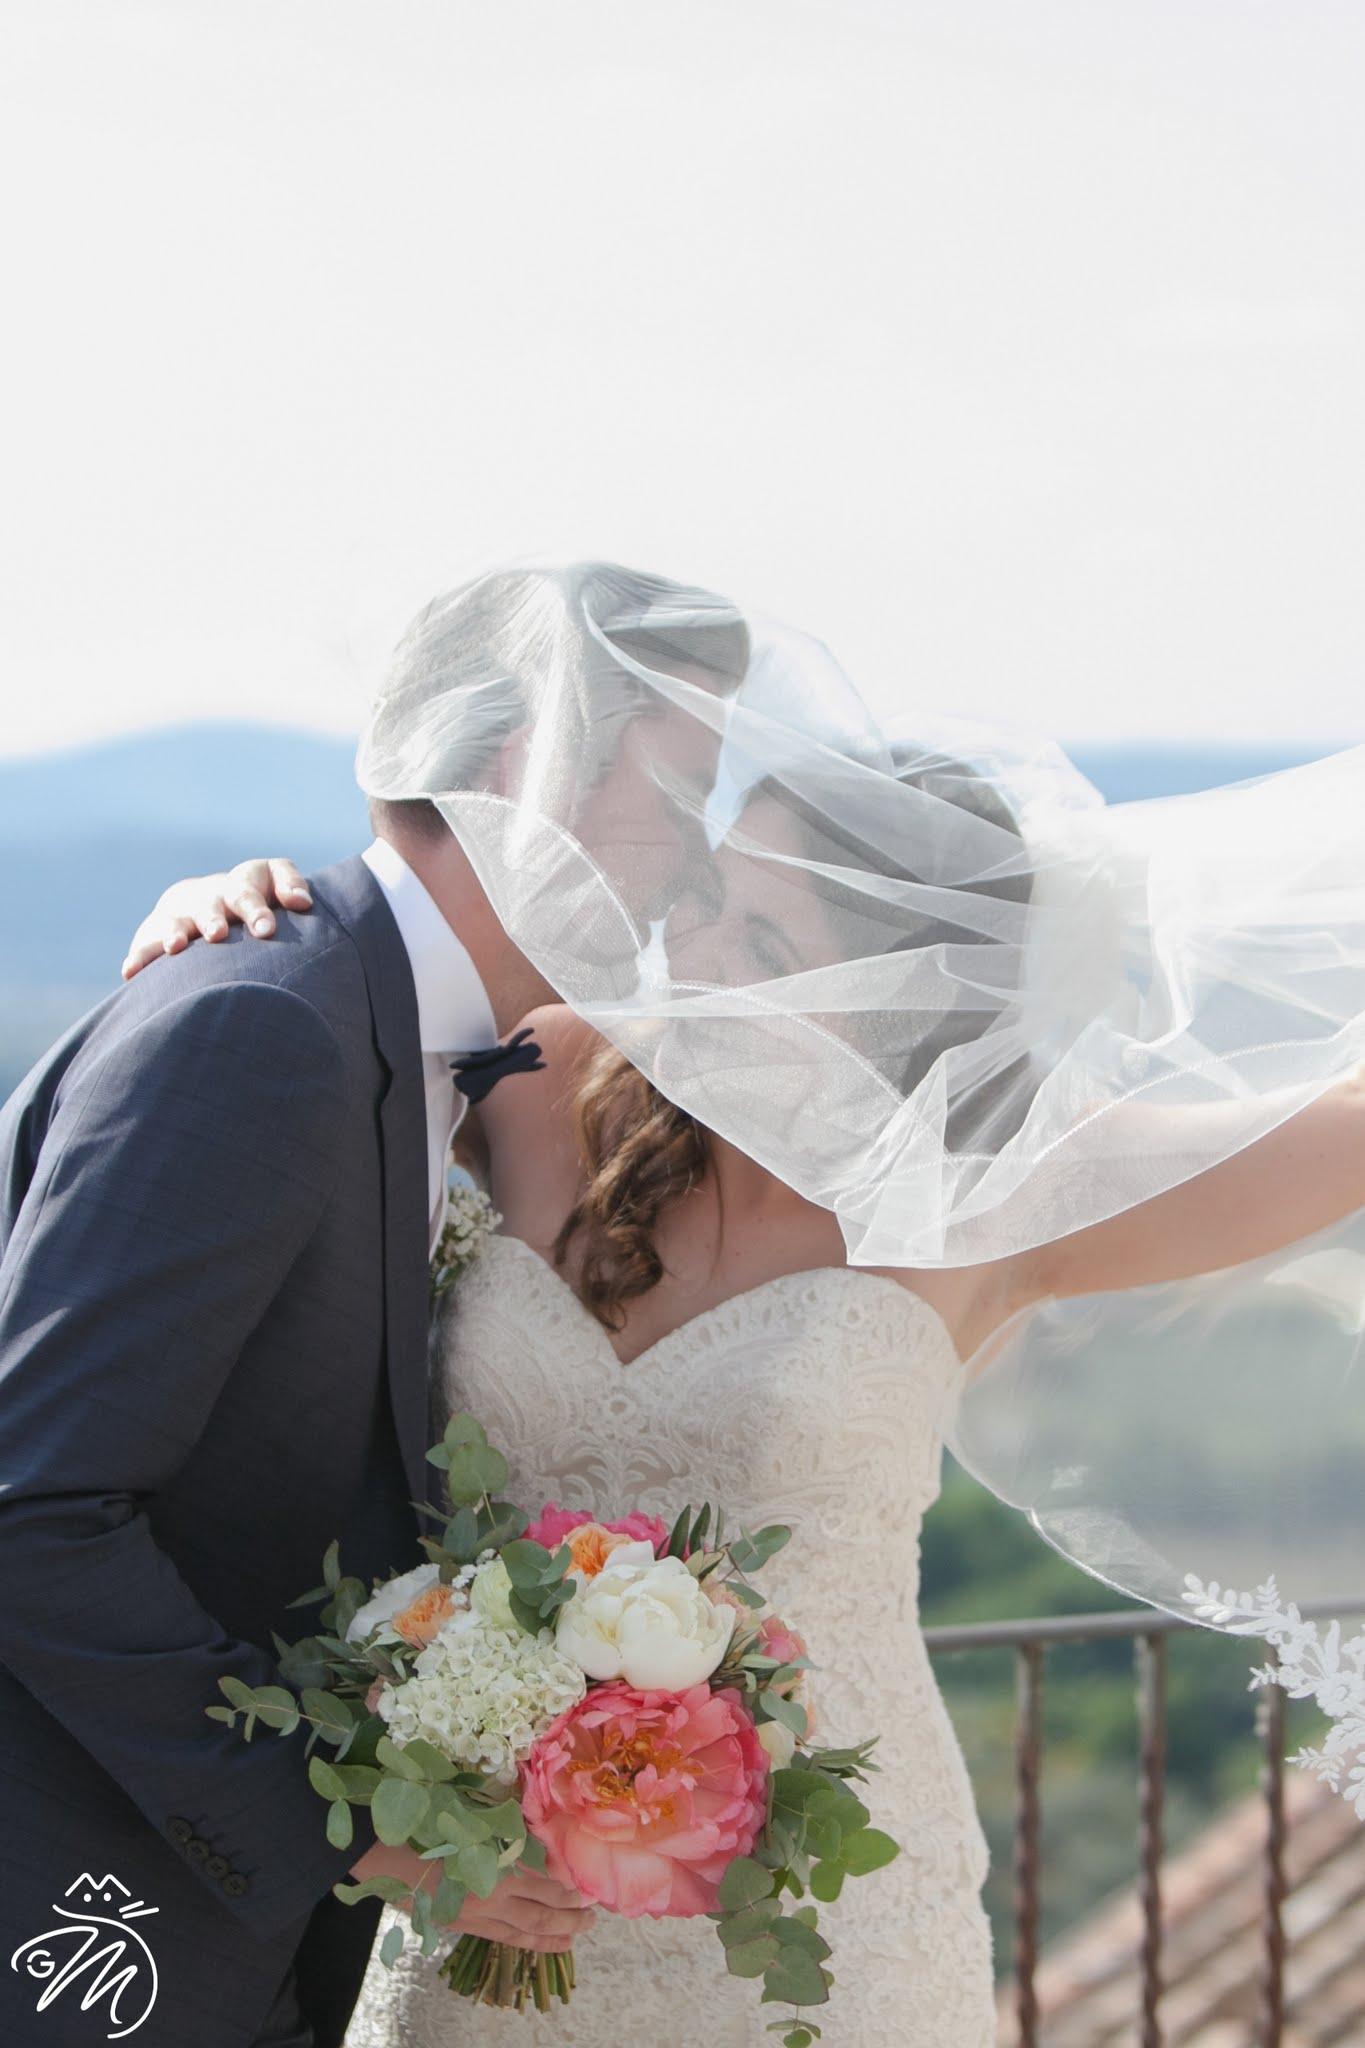 VERTICALI2_LOGO_HOME_PAGE_INTERNATIONAL_PHOTOGRAPHER_IN_ROME_WEDDING_DESTINATION_GIROLAMO_MONTELEONE_-49